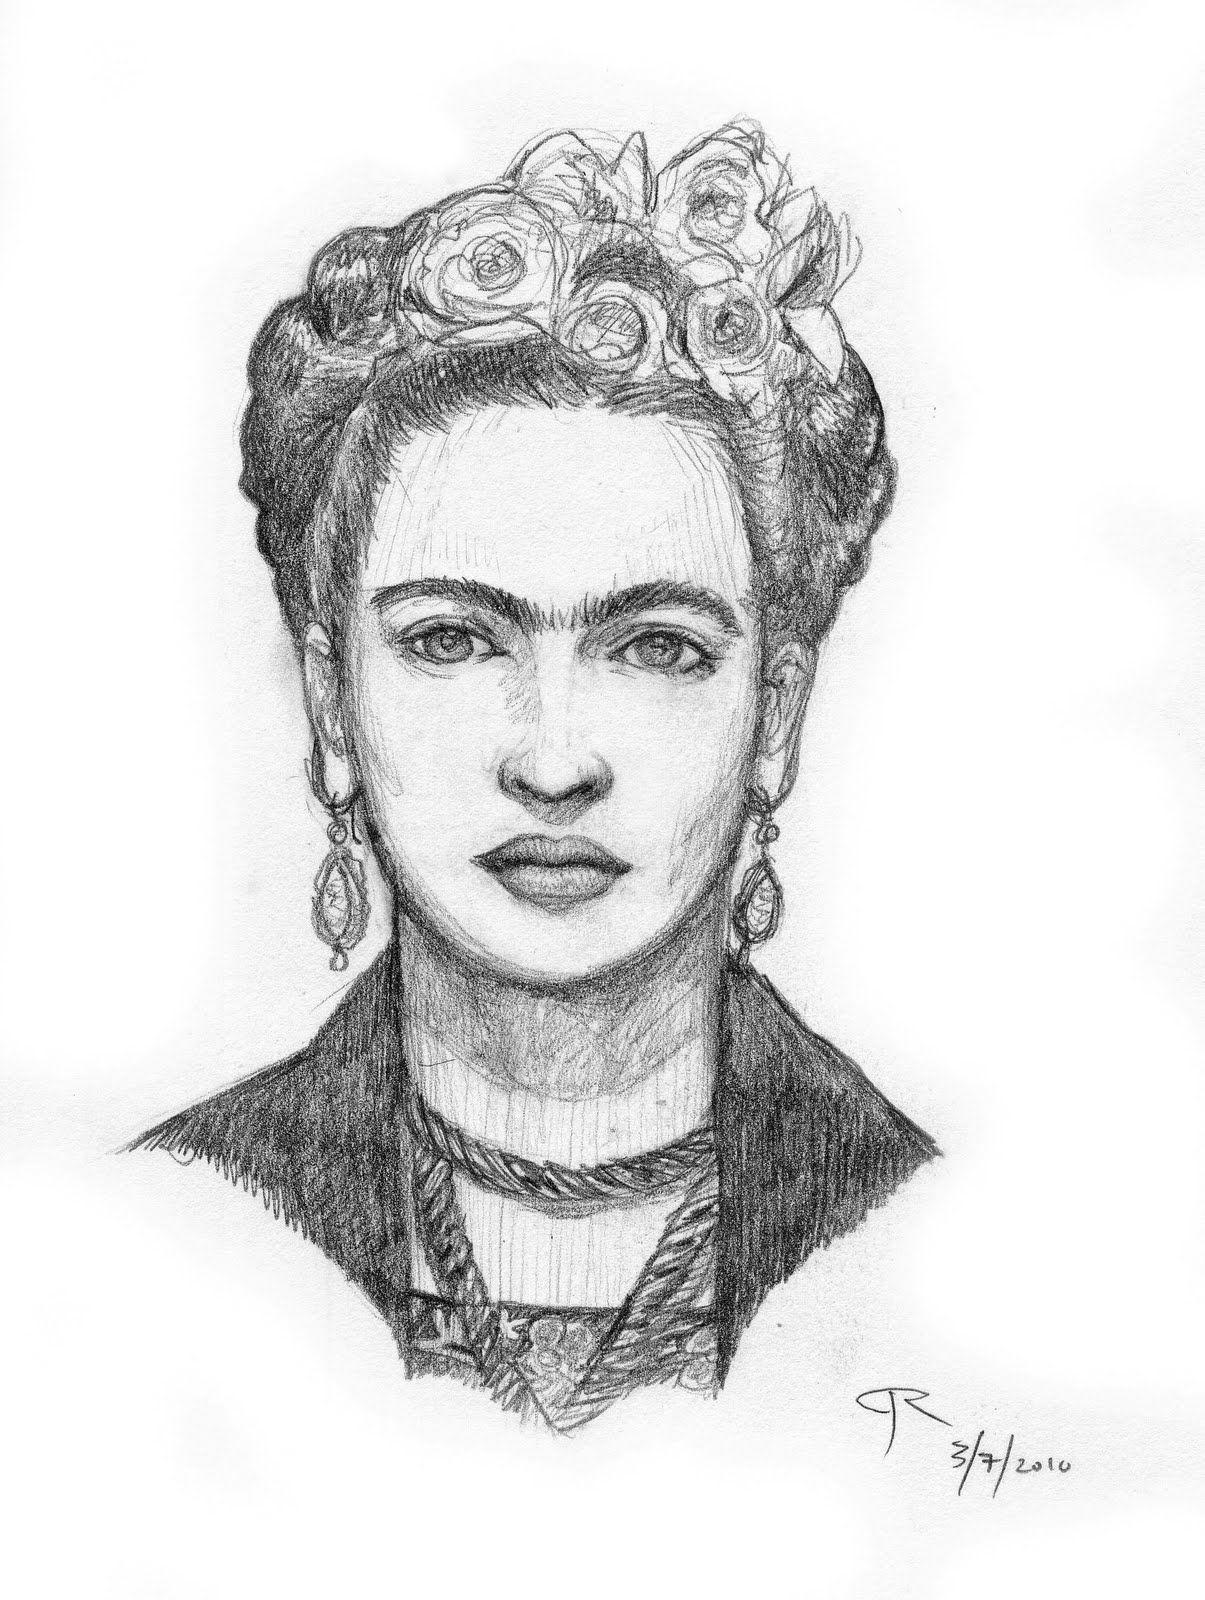 Rom E Mpire May 2010 Frida Kahlo Dibujo Fridah Kahlo Frida Kahlo